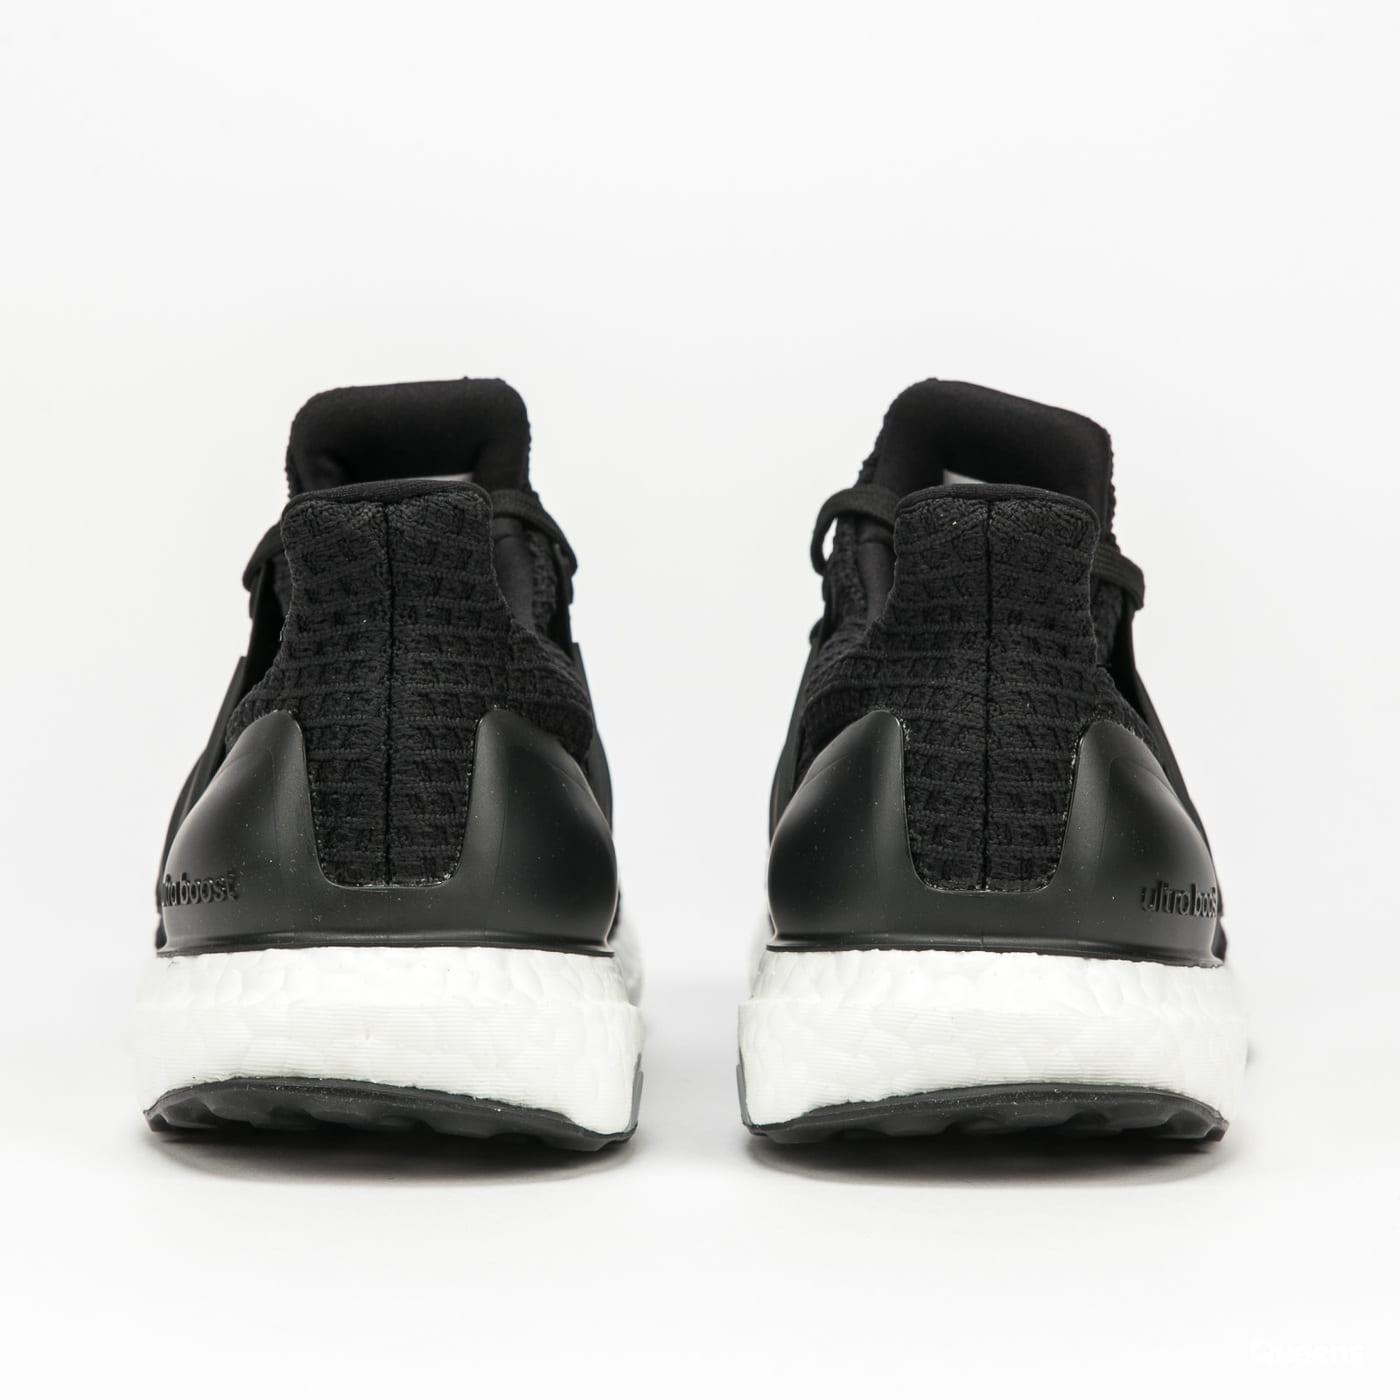 adidas Performance UltraBoost 4.0 DNA W cblack / cblack / ftwwht